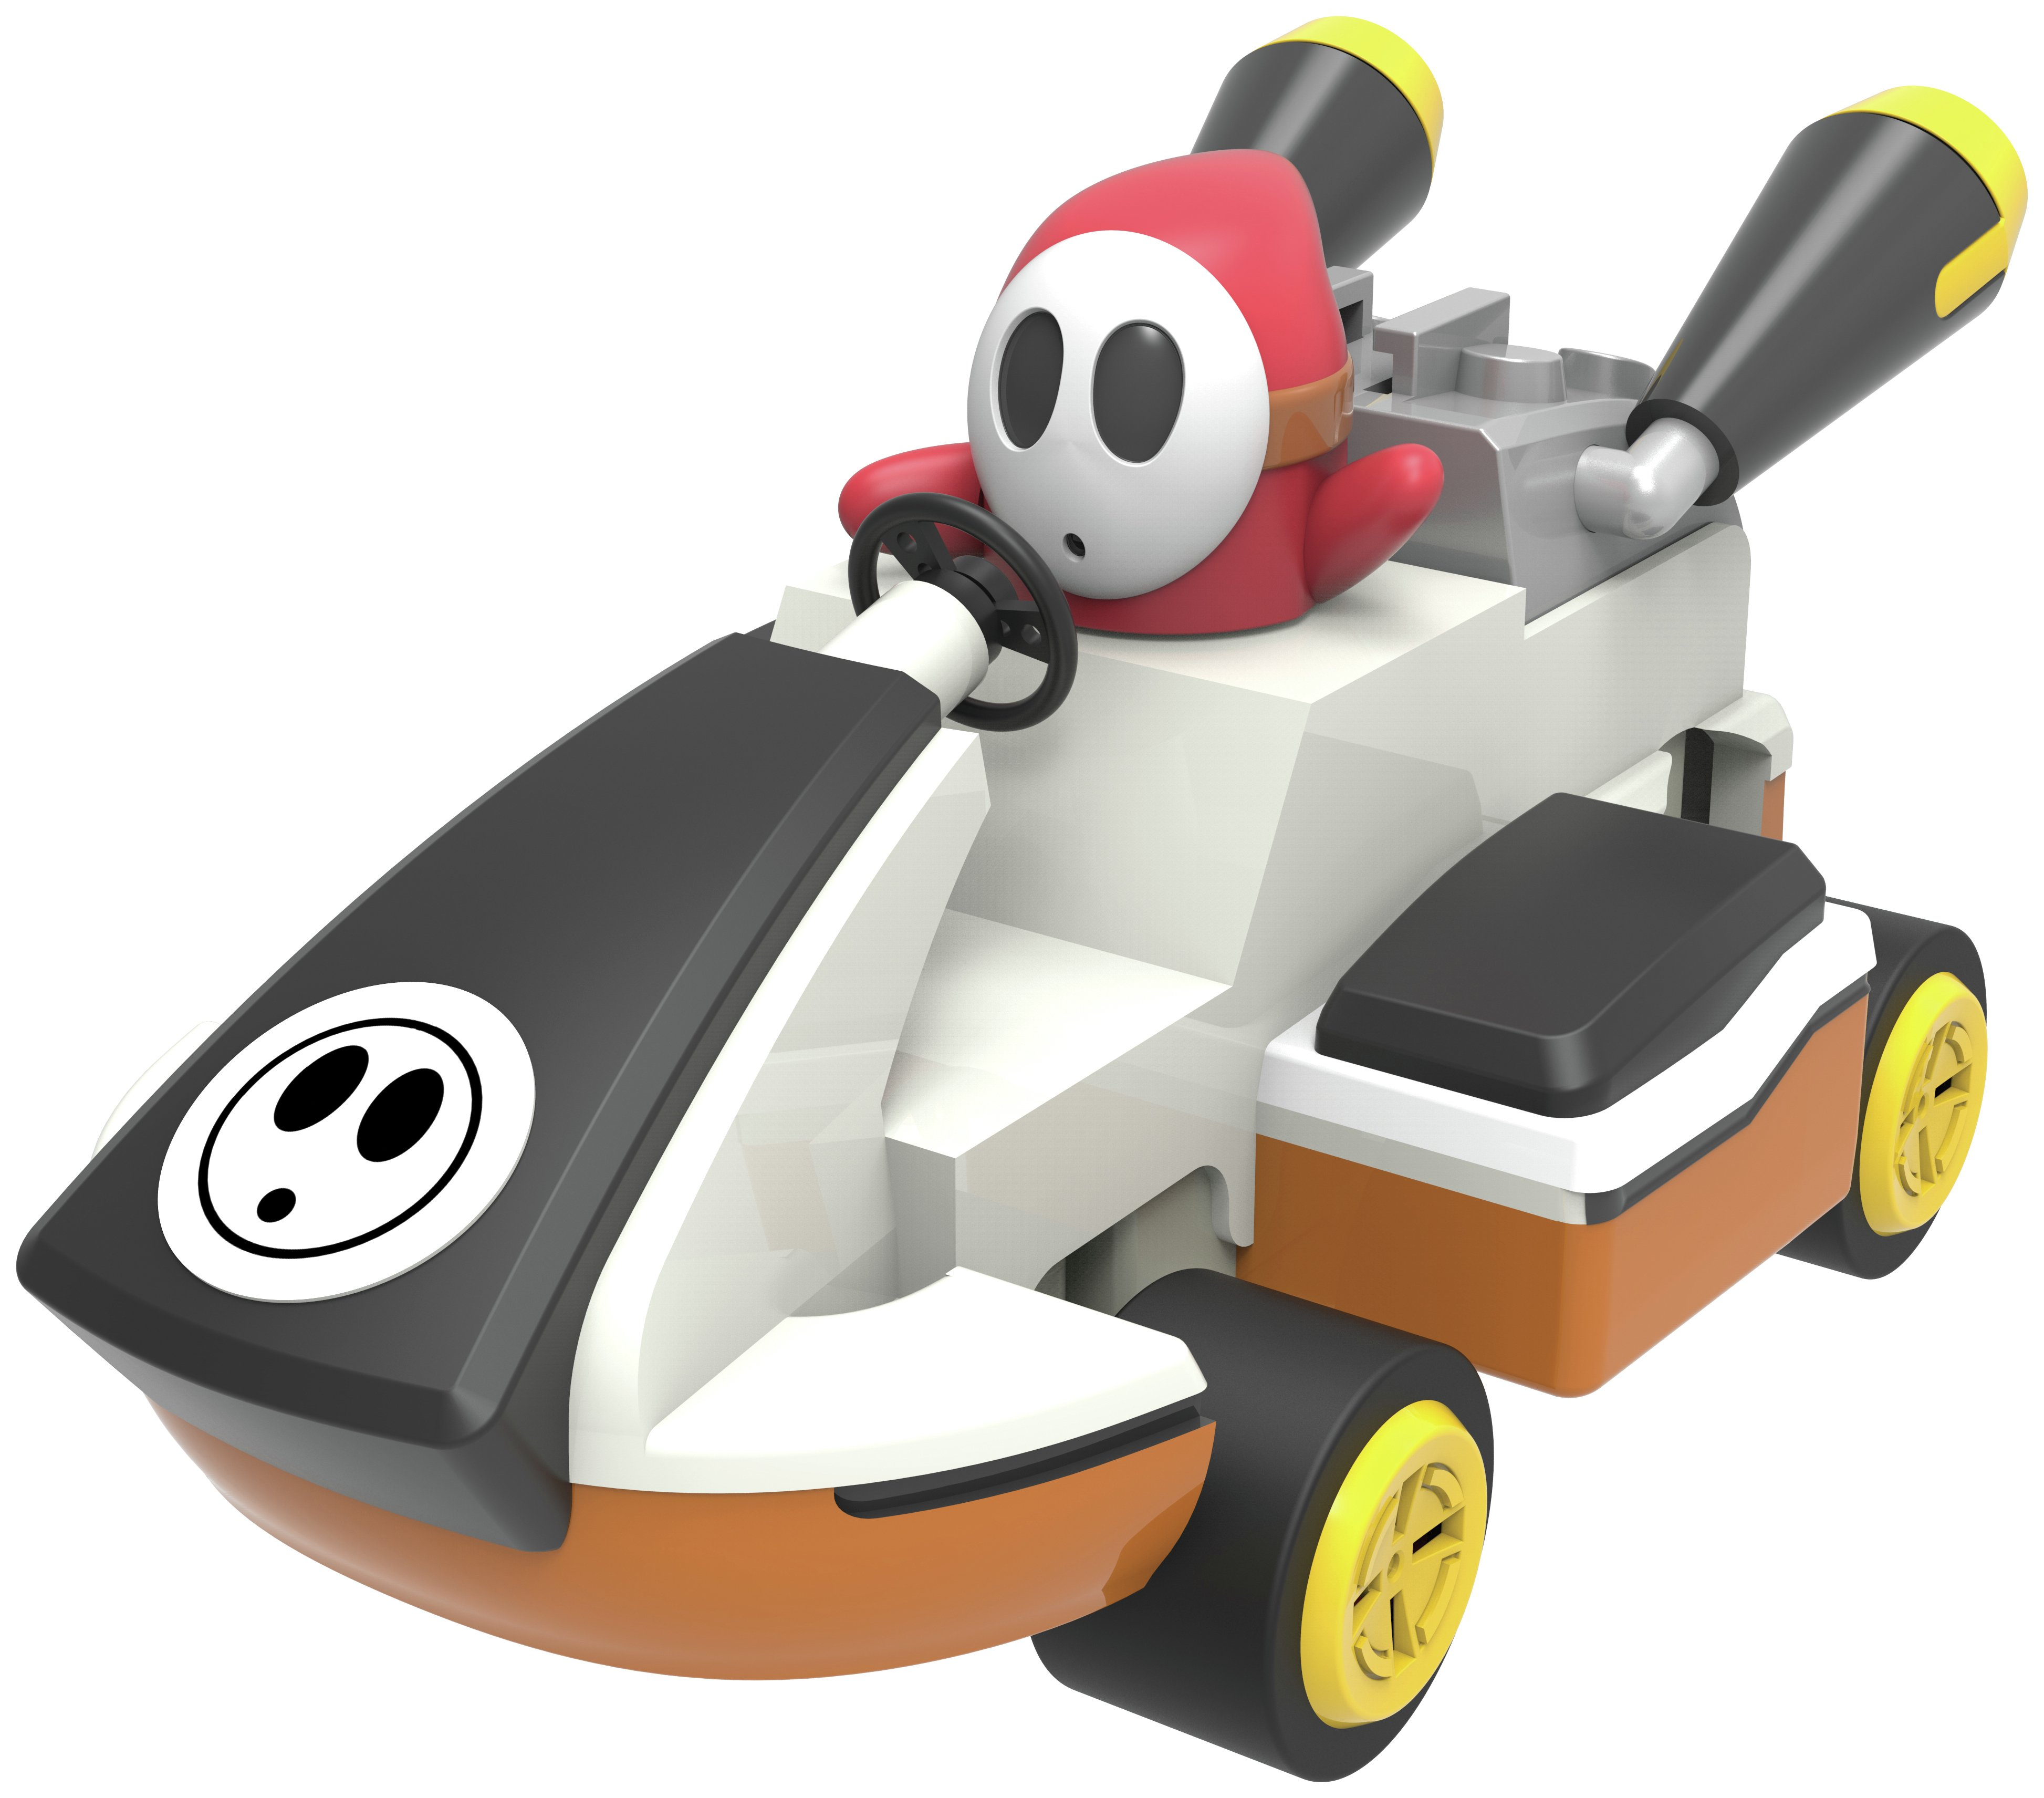 knex-mario-kart-shy-guy-building-set